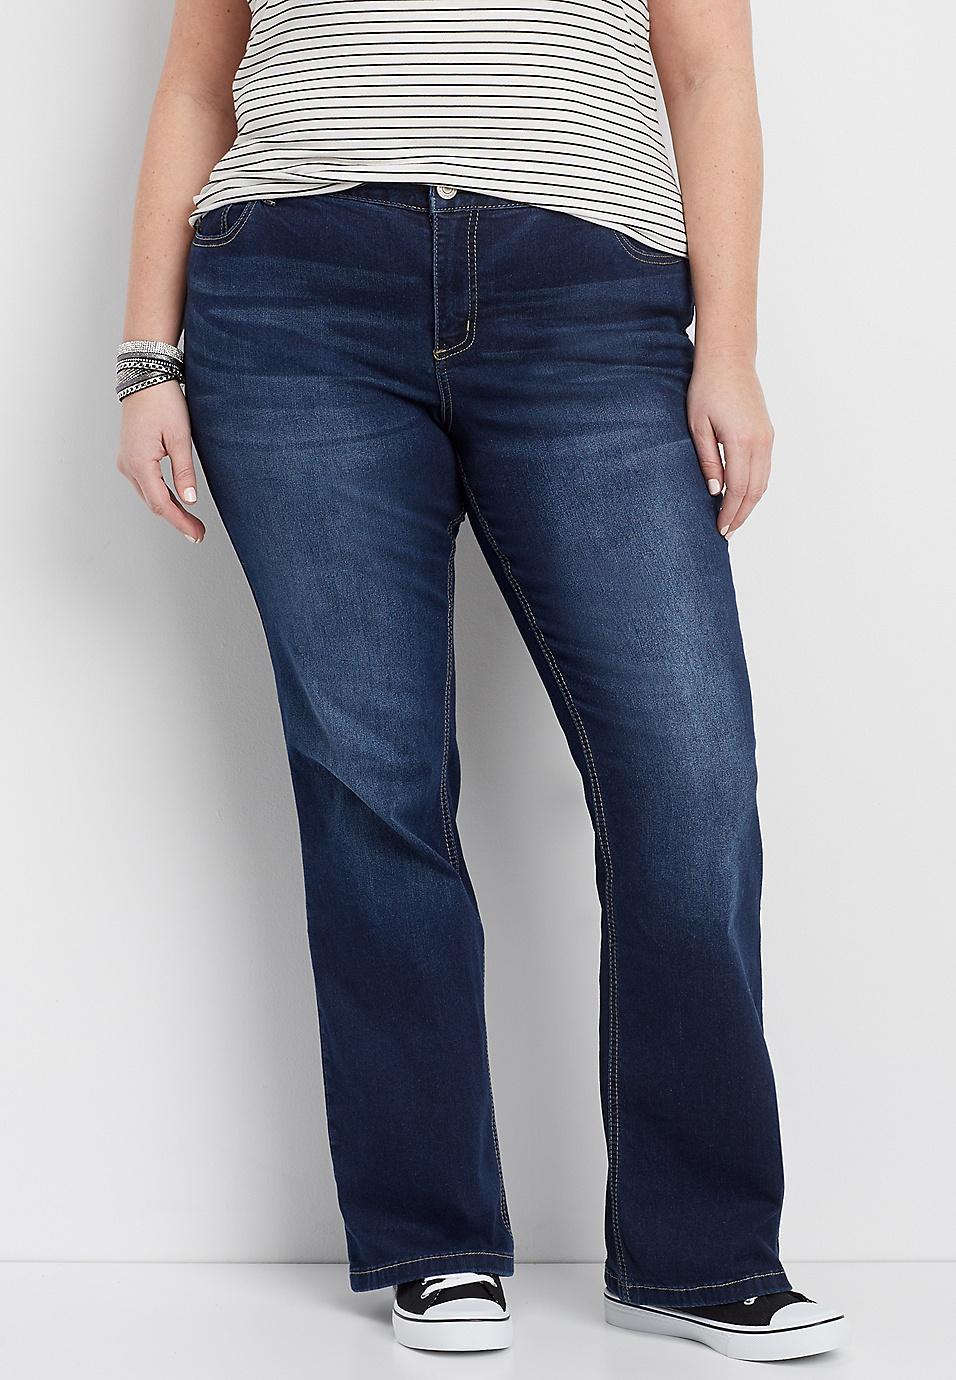 8d1c2b70951 DenimFlex™ plus size dark wash curvy bootcut jeans